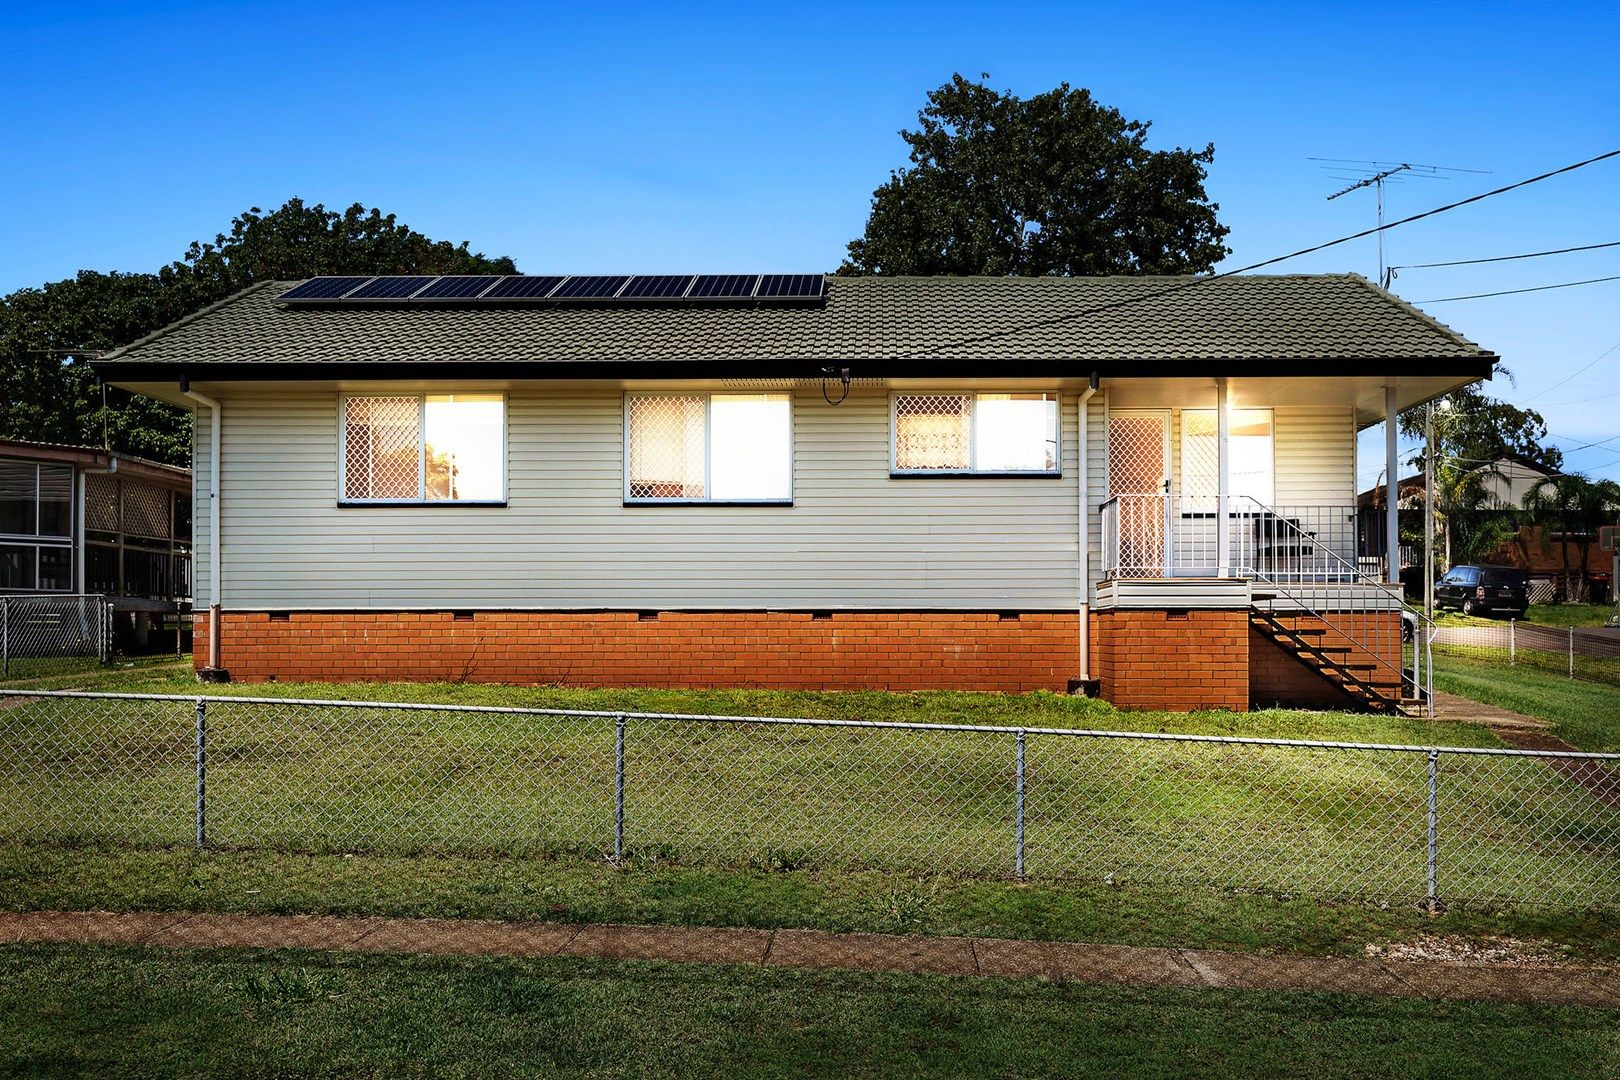 28 Playford Street, Bracken Ridge QLD 4017, Image 0